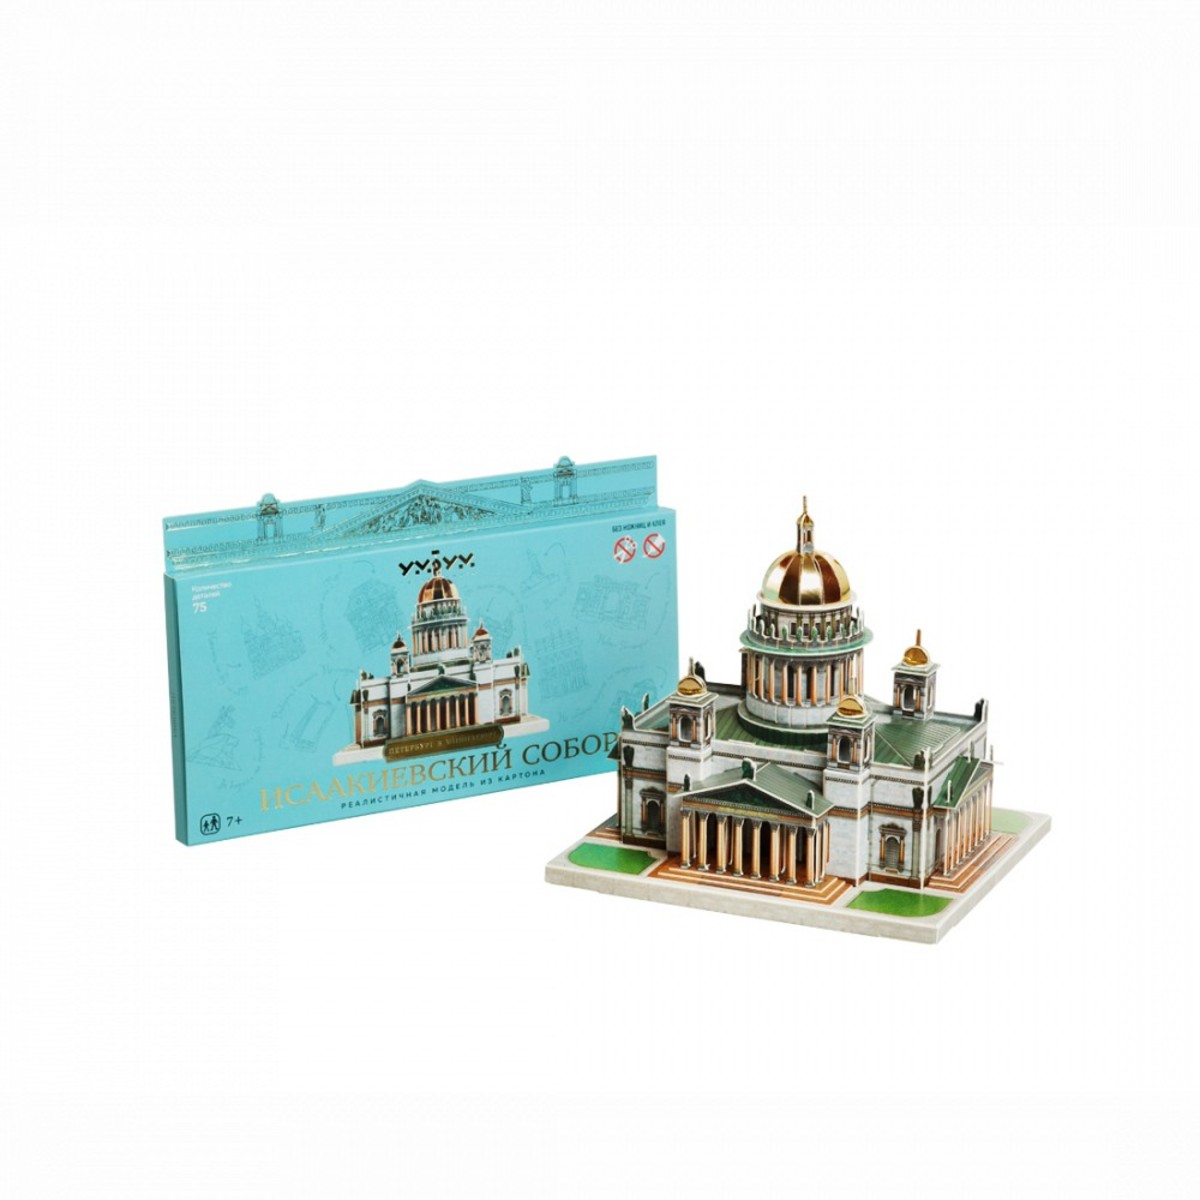 Catedral de San Issac, Puzzle de Cartón para montar. Marca Clever Paper, Ref: 14590.